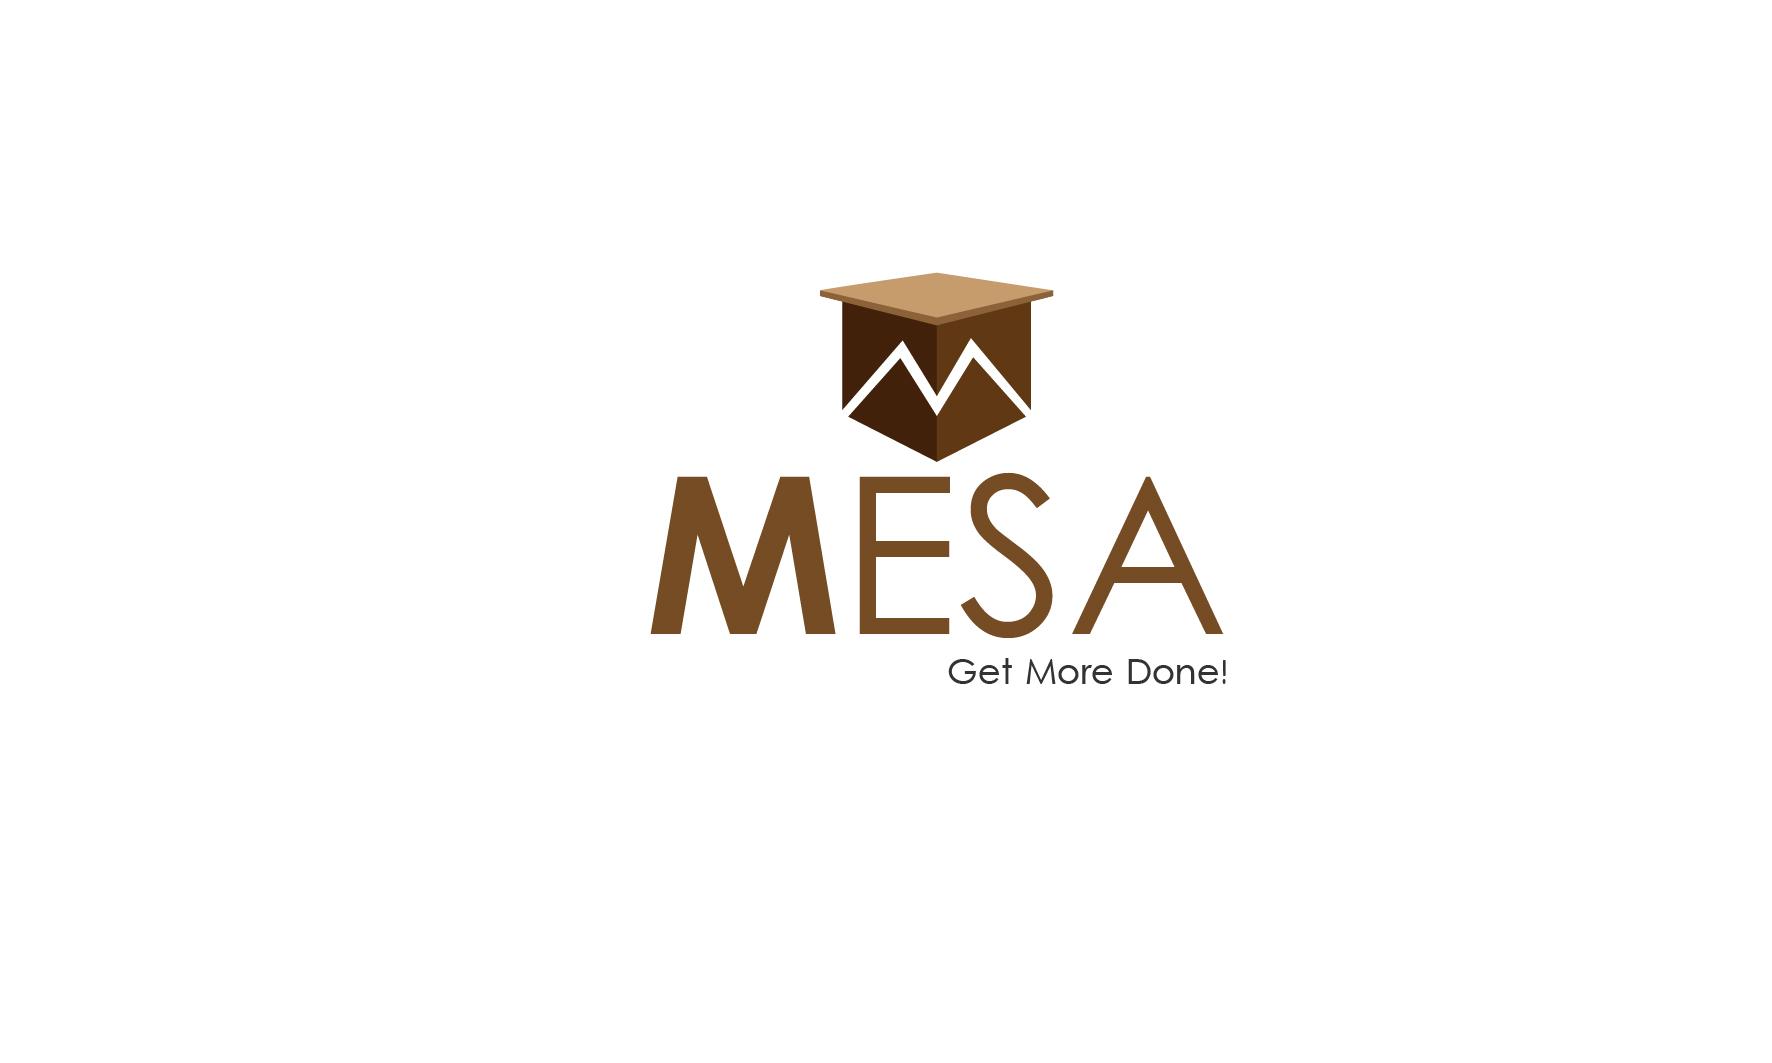 Logo Design by 3draw - Entry No. 150 in the Logo Design Contest Logo Design for Mesa.